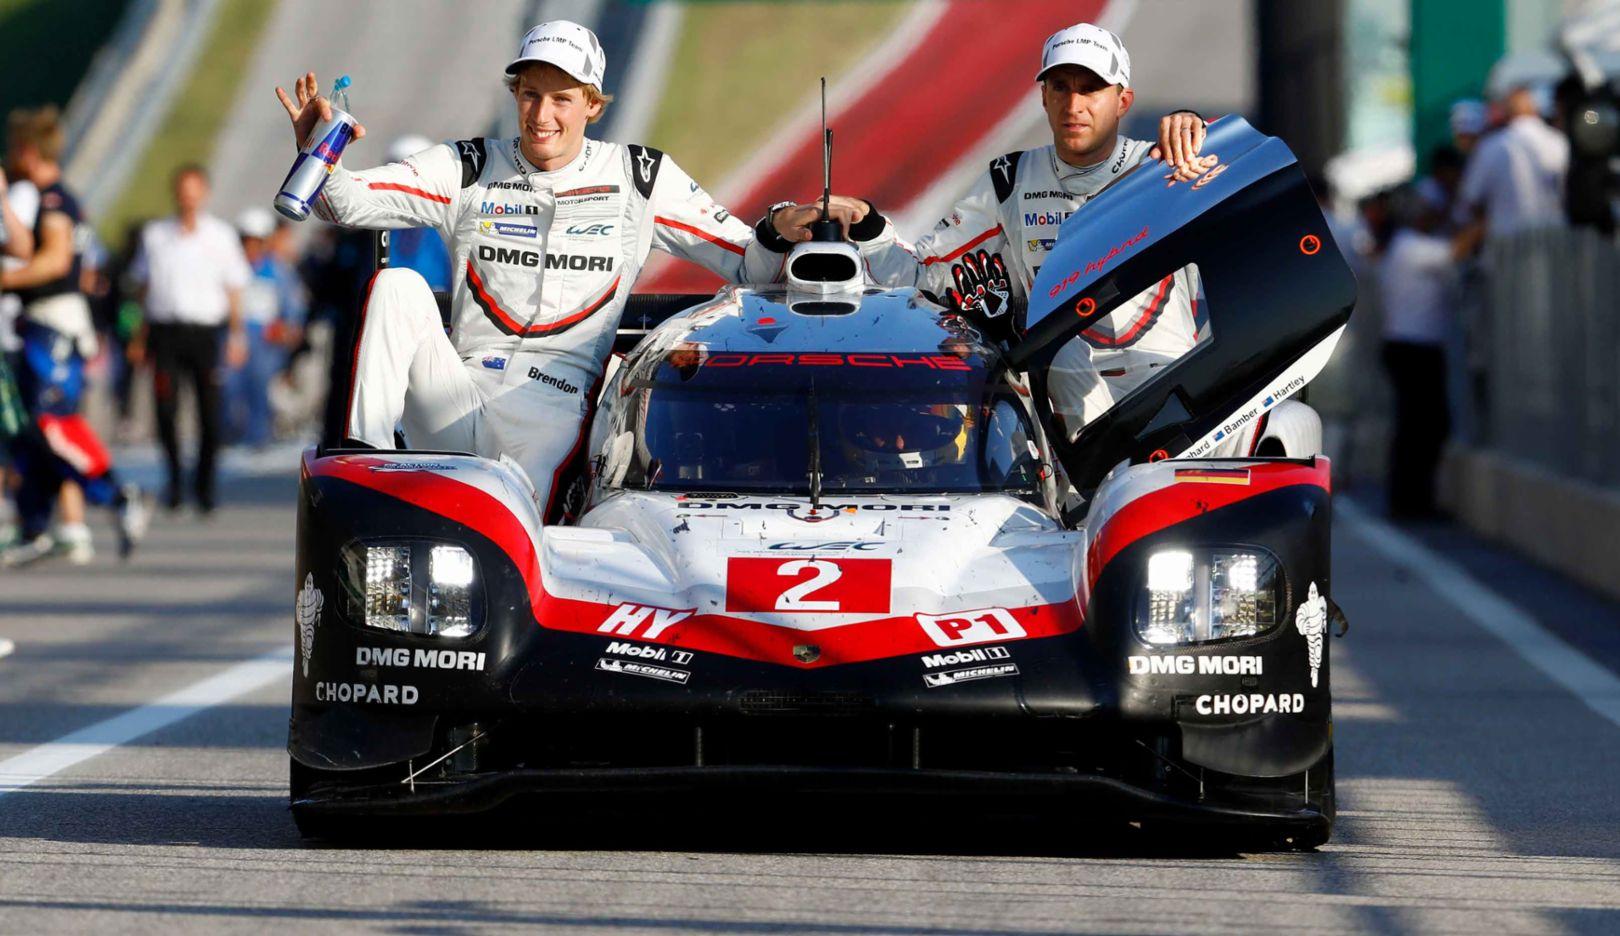 Brendon Hartley, Earl Bamber, Timo Bernhard, 919 Hybrid, WEC, Rennen, Austin, 2017, Porsche AG